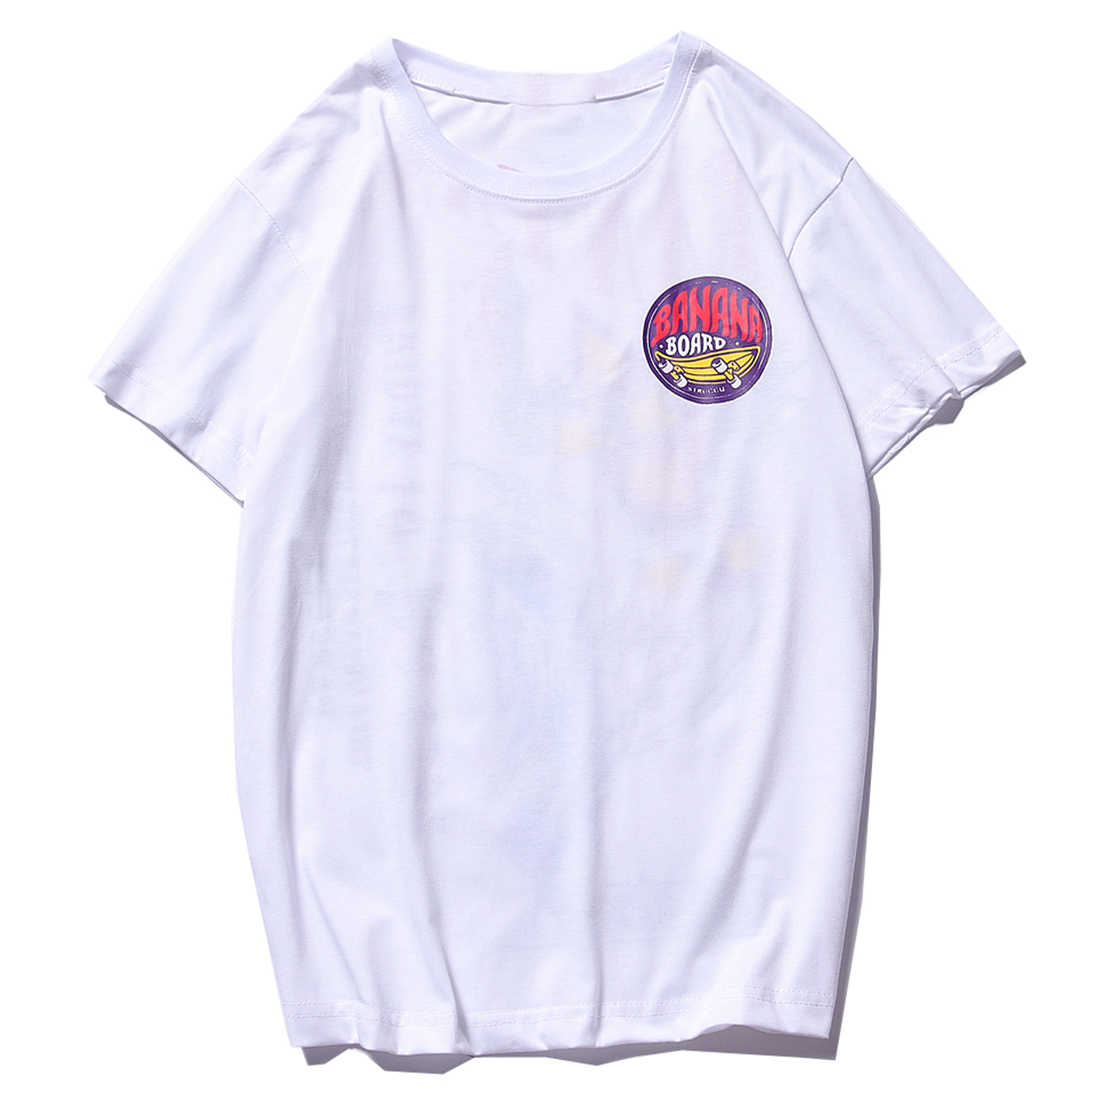 Aelfric Eden Skateboard Afdrukken Mannen T Shirts Streetwear 2019 Hip Hop Harajuku Korte Mouw Tops Zomer Mode Toevallige Mannelijke T shirt